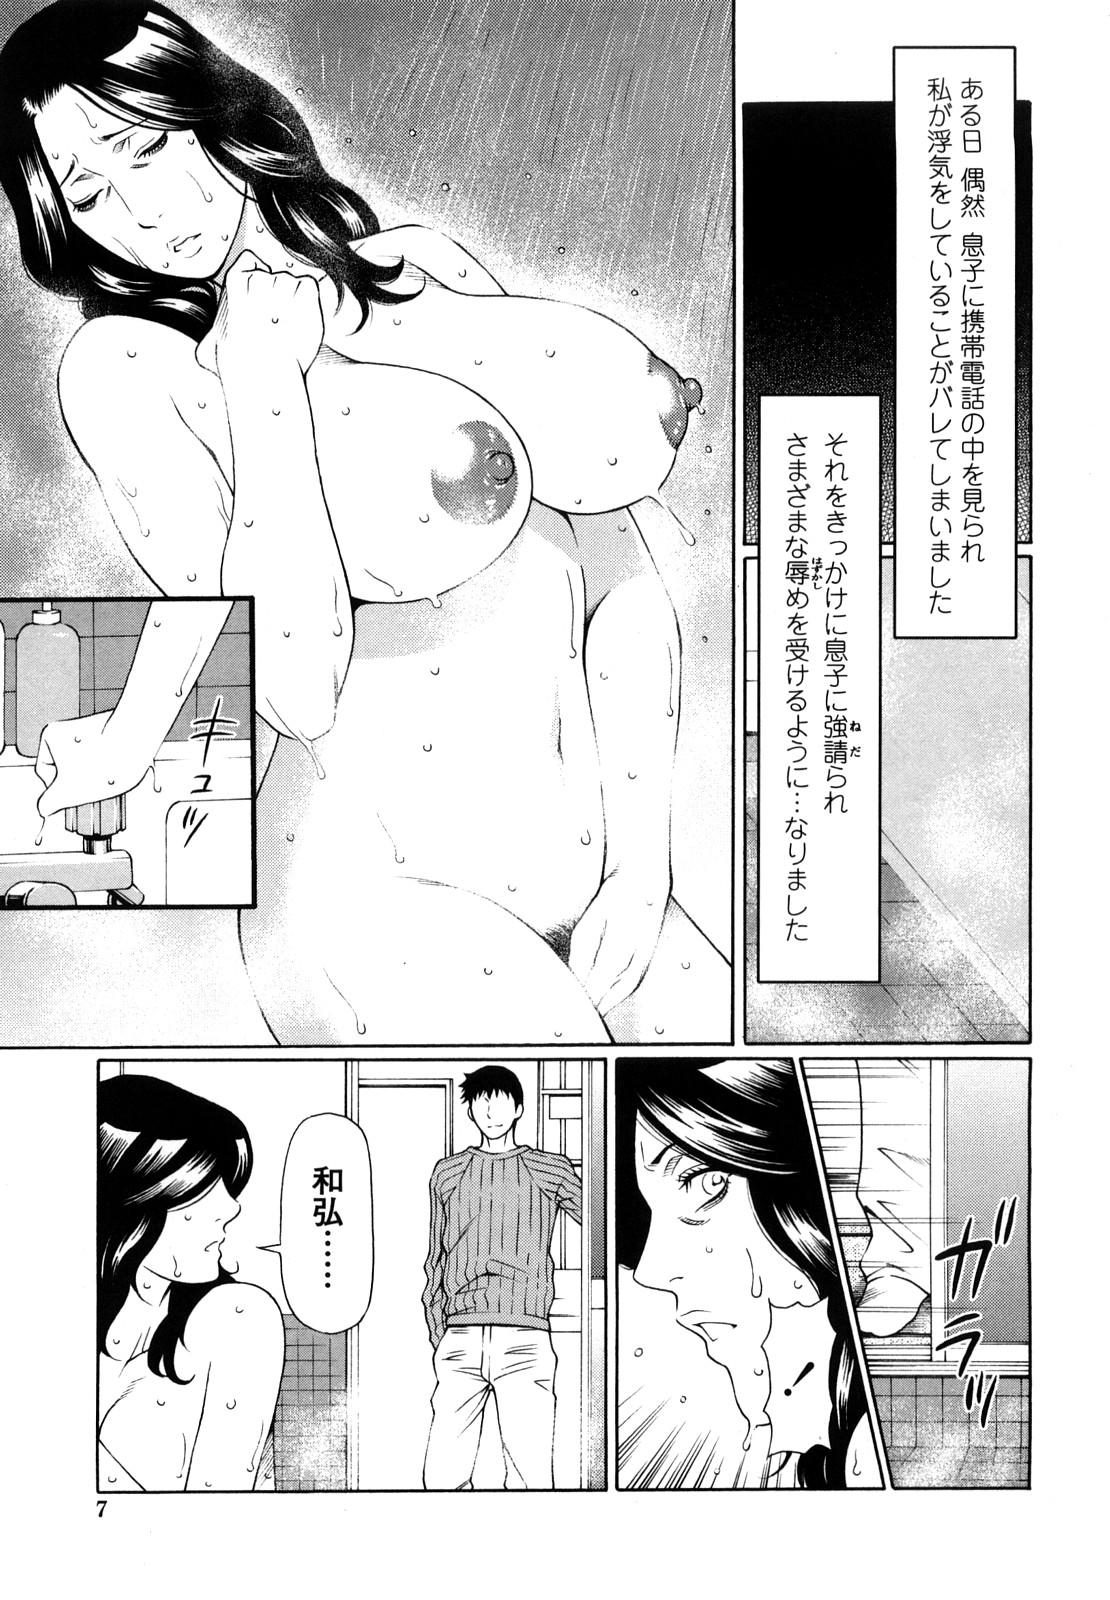 [Takasugi Kou] Kindan no Haha-Ana - Immorality Love-Hole [Decensored] 8